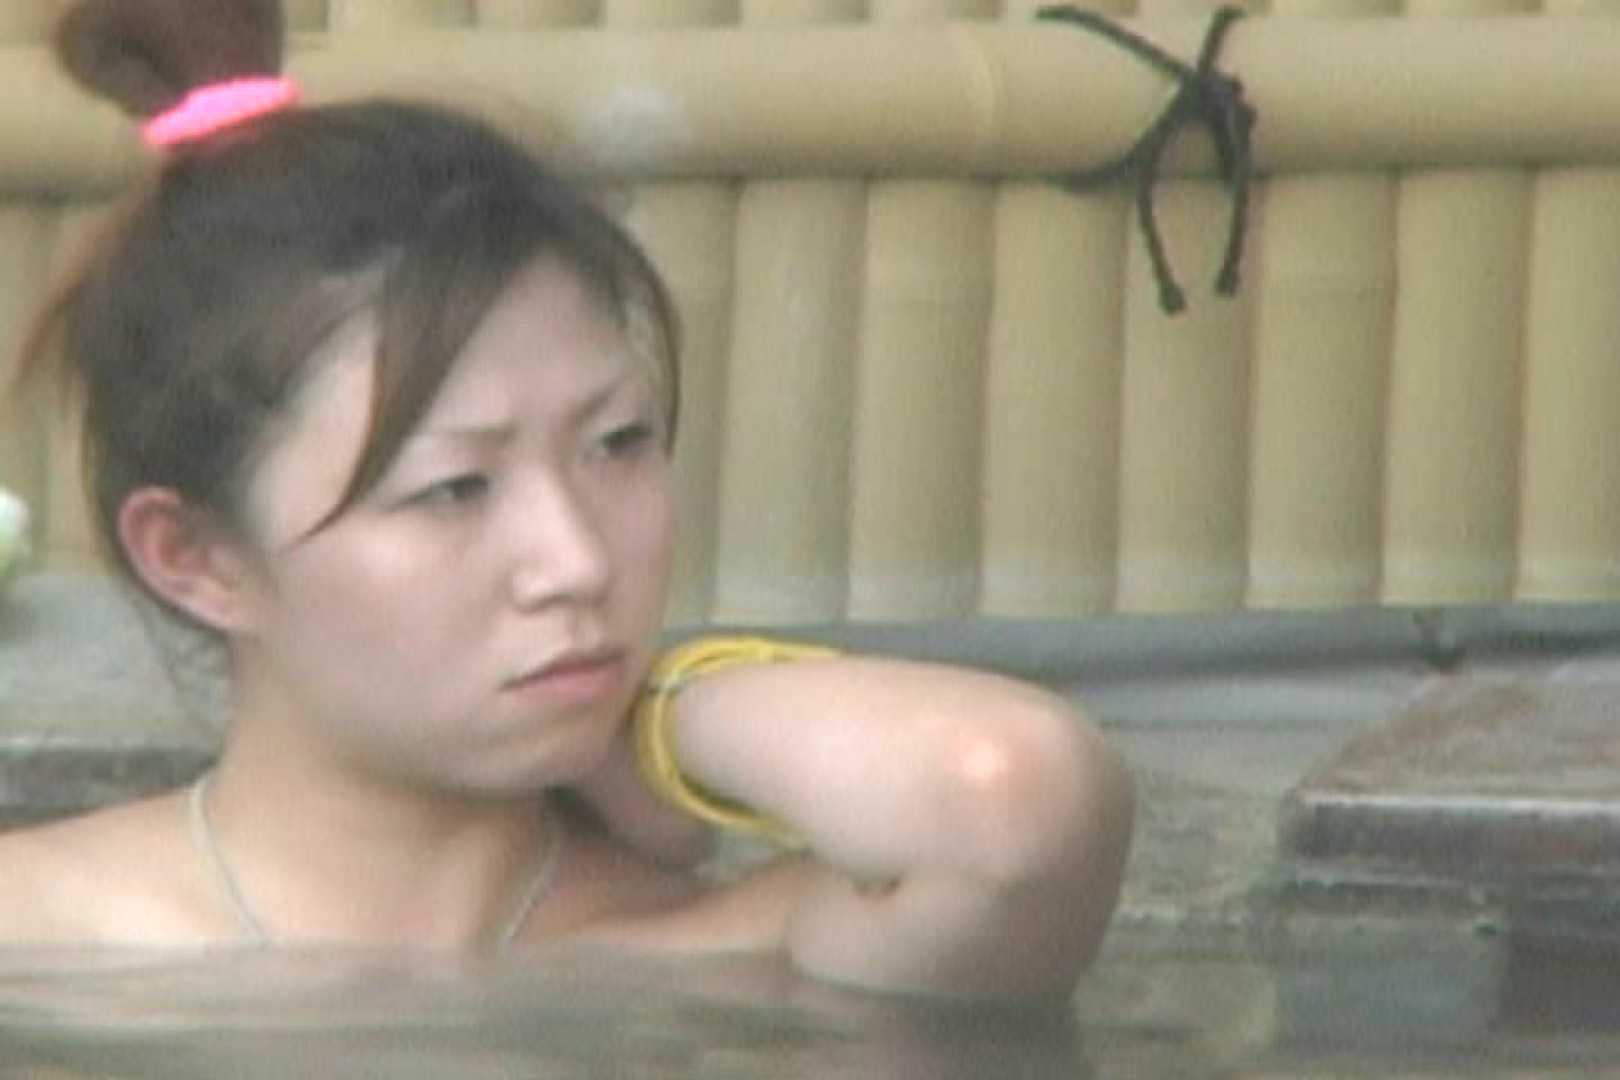 Aquaな露天風呂Vol.593 美しいOLの裸体 | 露天風呂突入  83pic 16